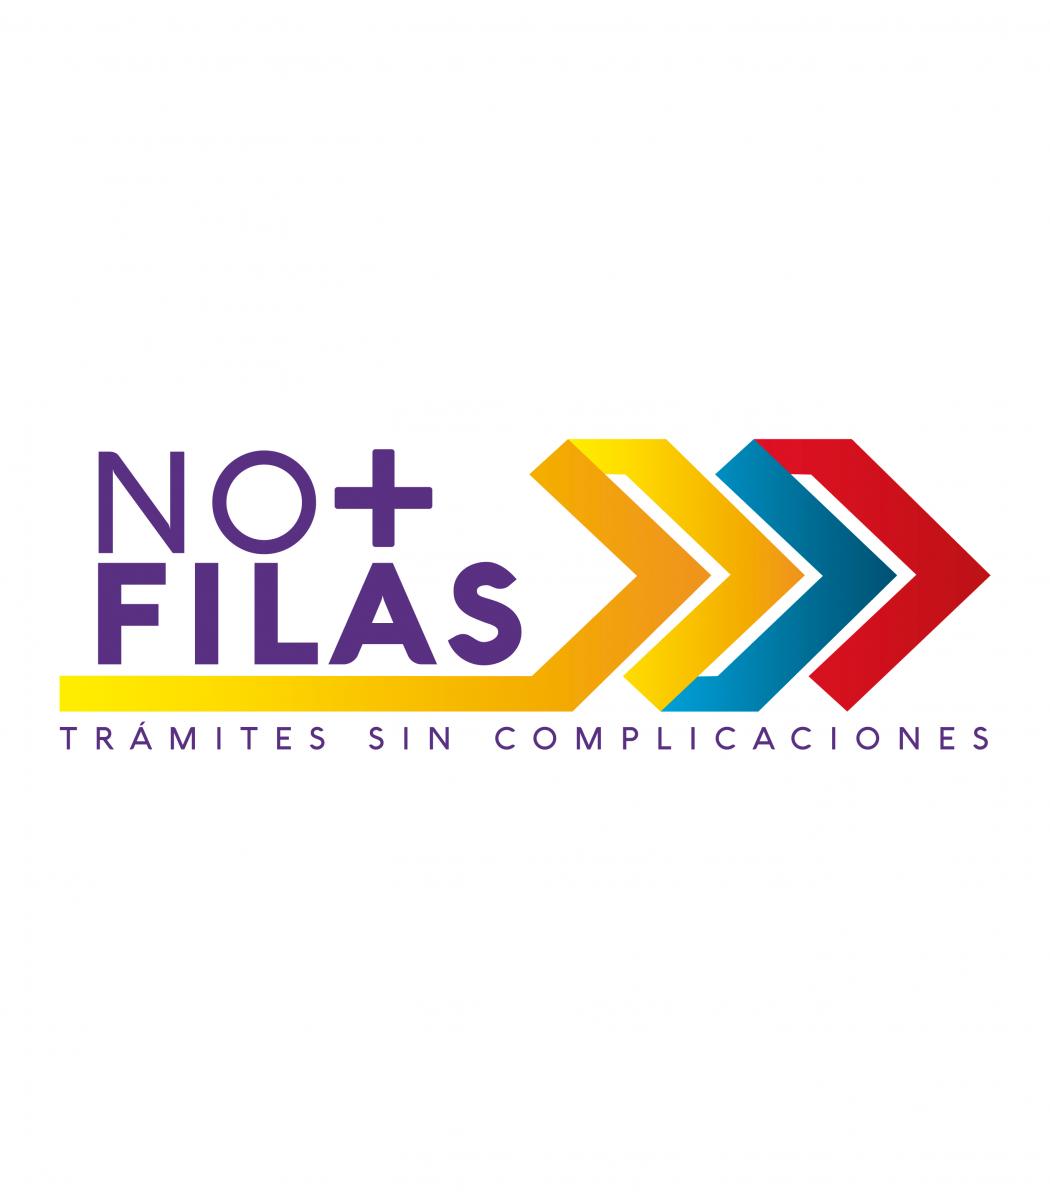 logo-nomasfilas_centrado.png